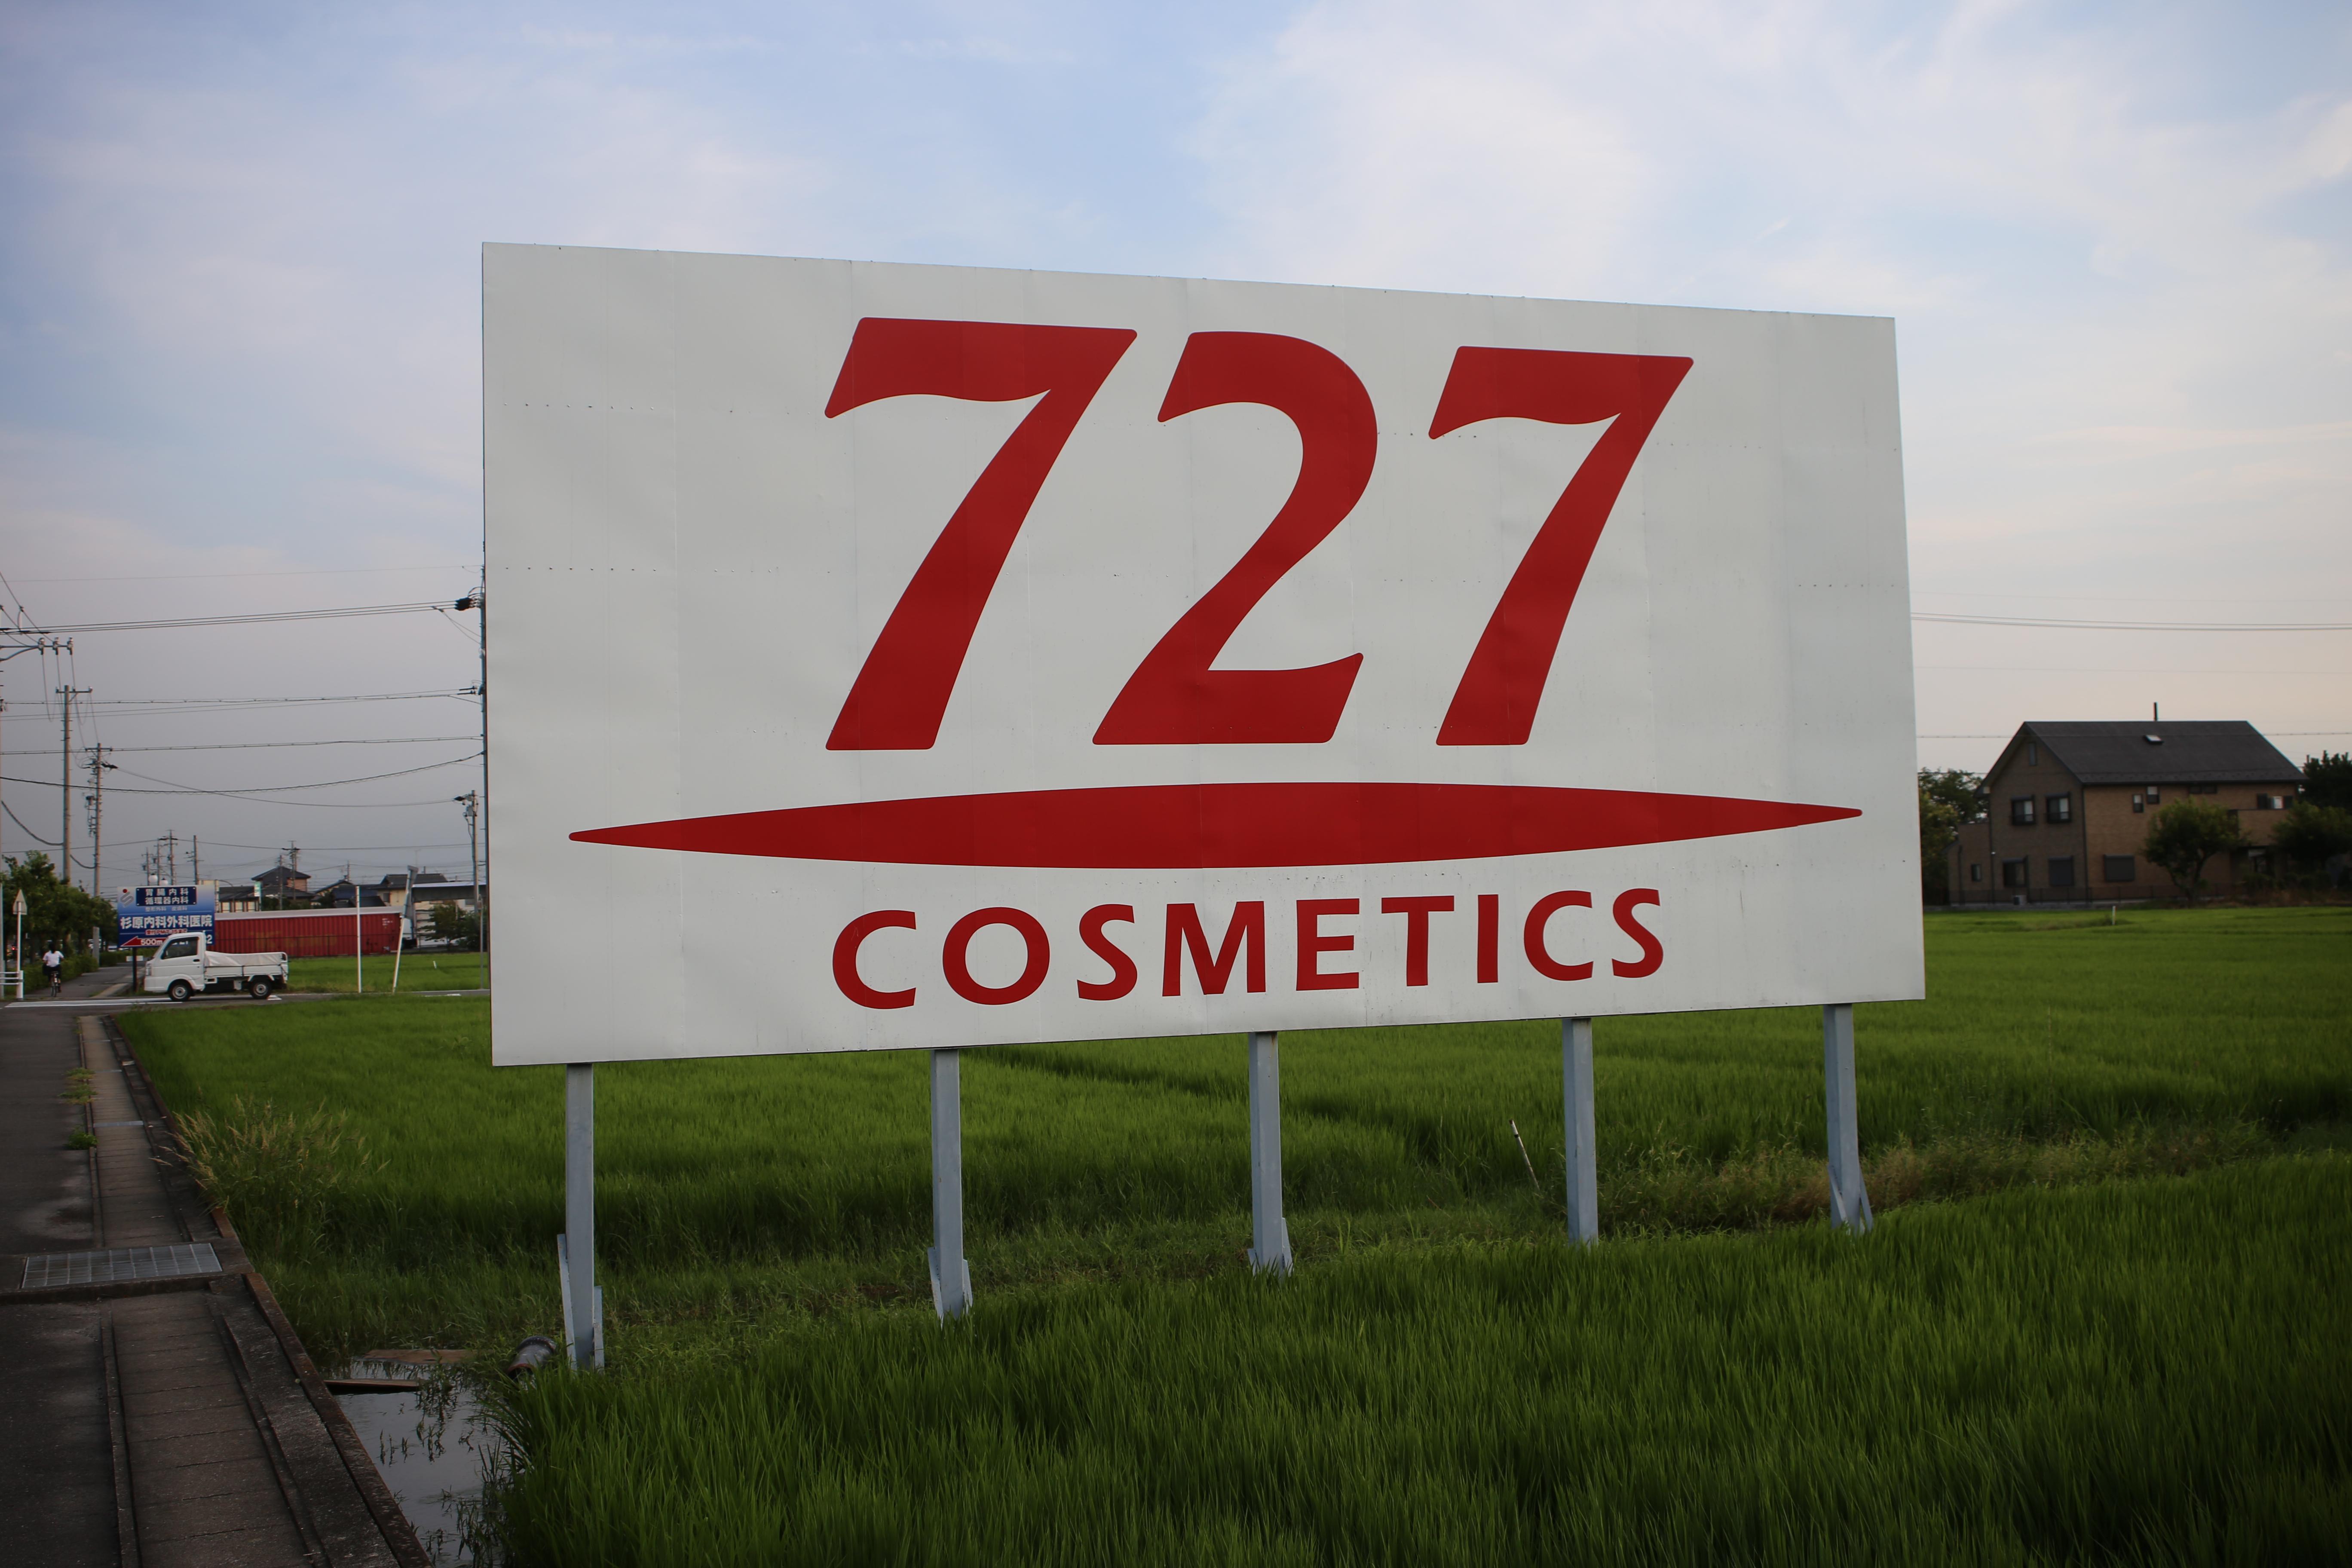 https://upload.wikimedia.org/wikipedia/commons/c/cb/727_Cosmetics_Board_20160803.jpg